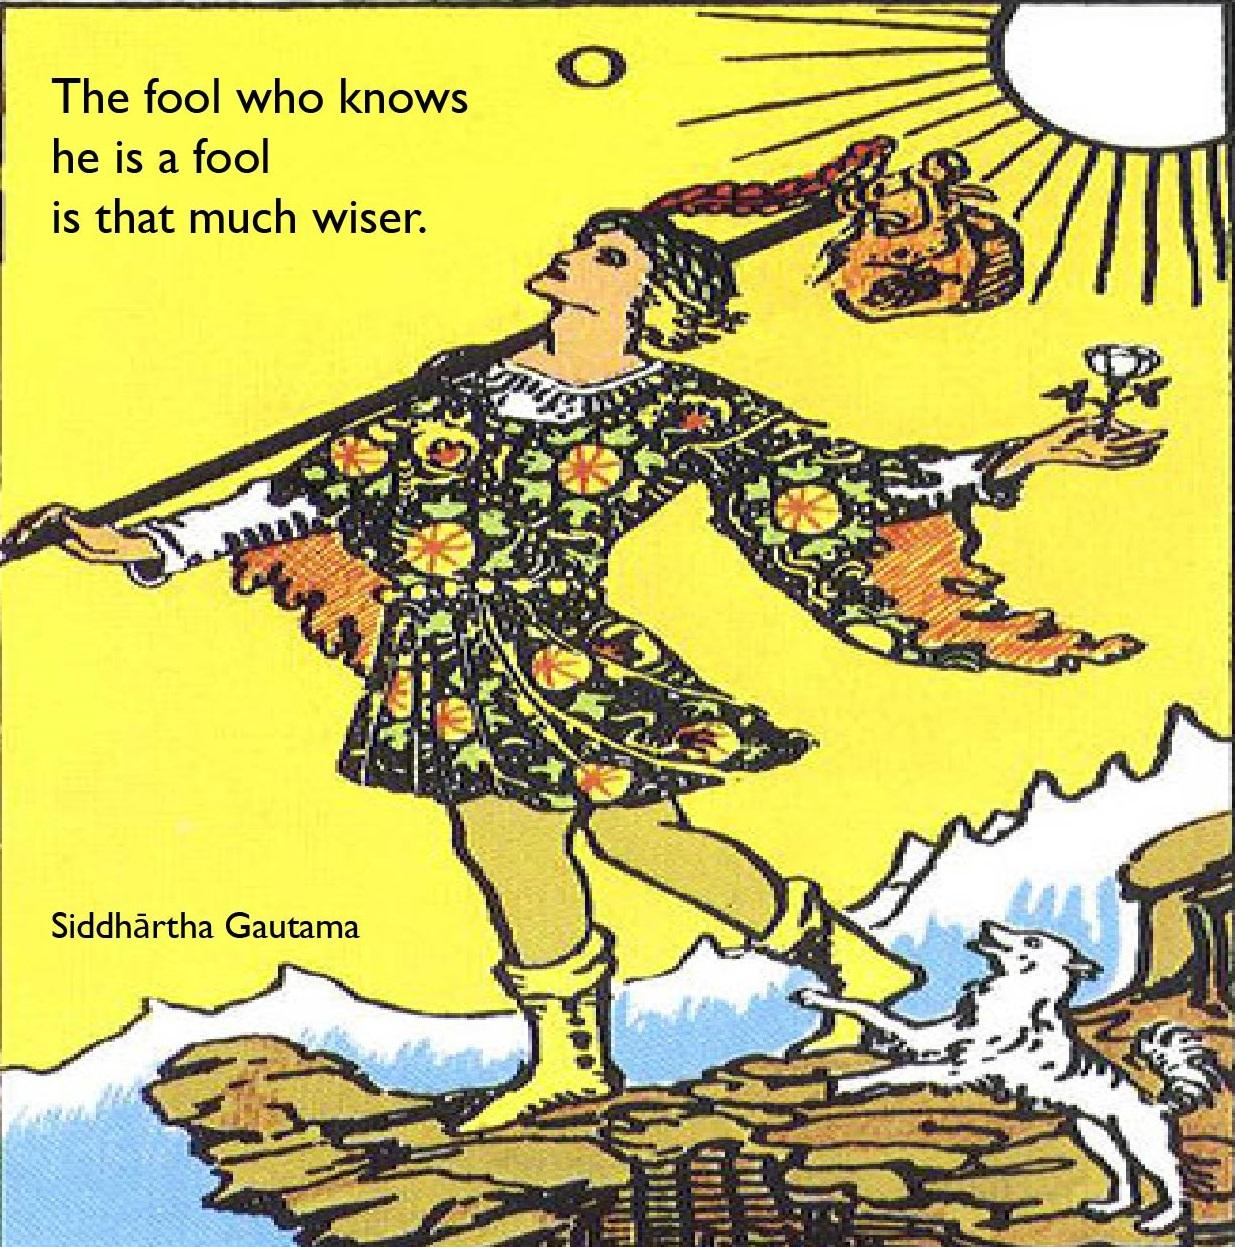 fool.wiser